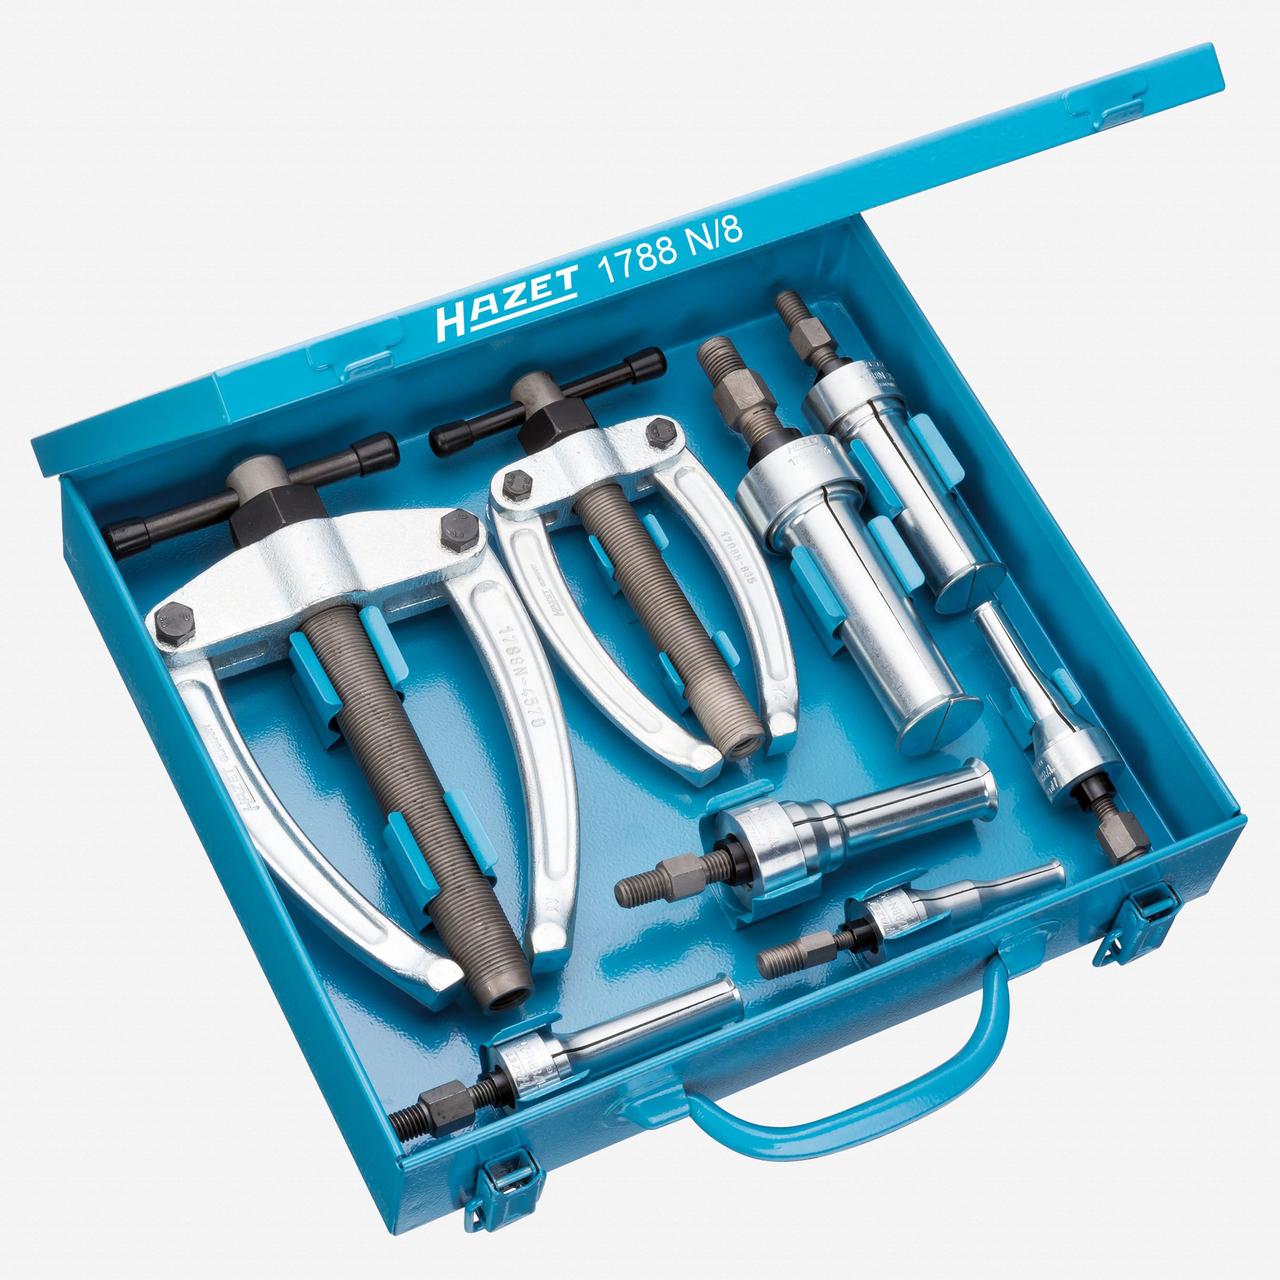 Hazet 1788N/8 Internal extractor set   - KC Tool